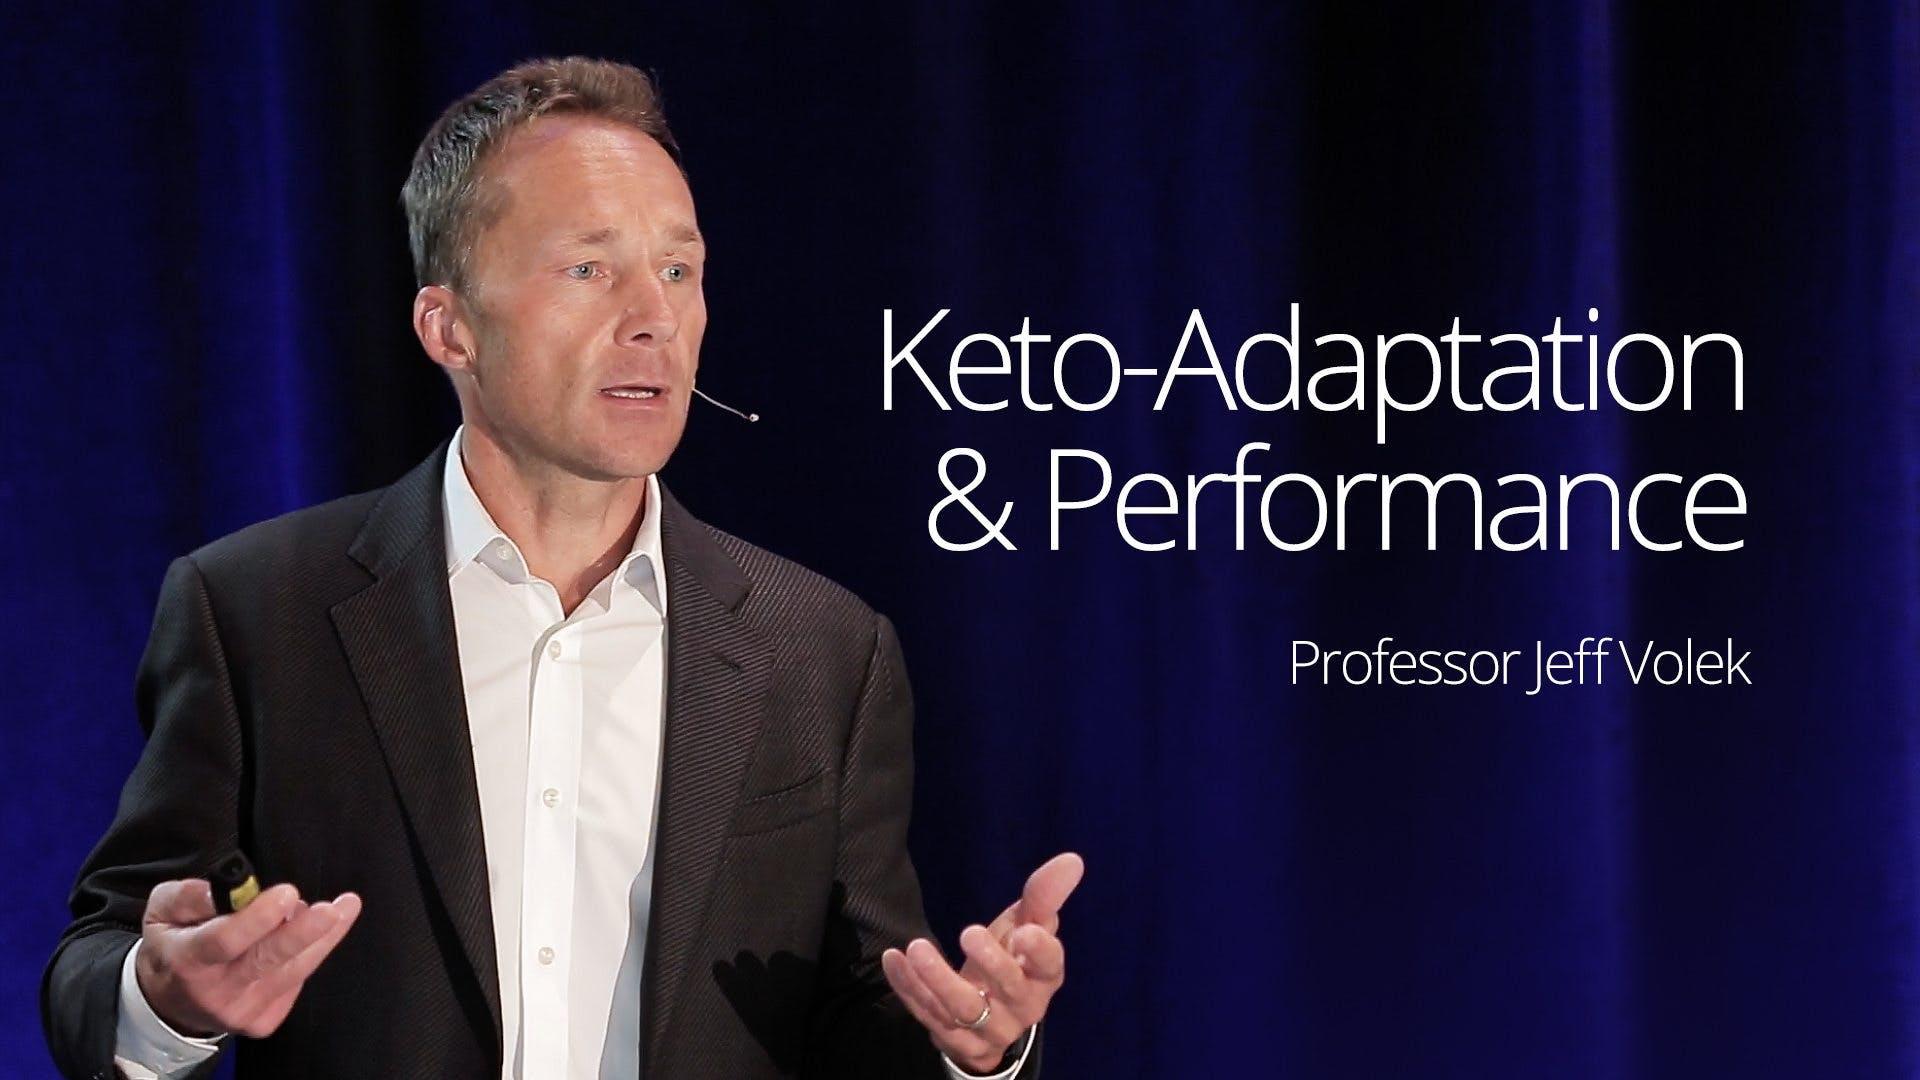 Keto-Adaptation and Performance